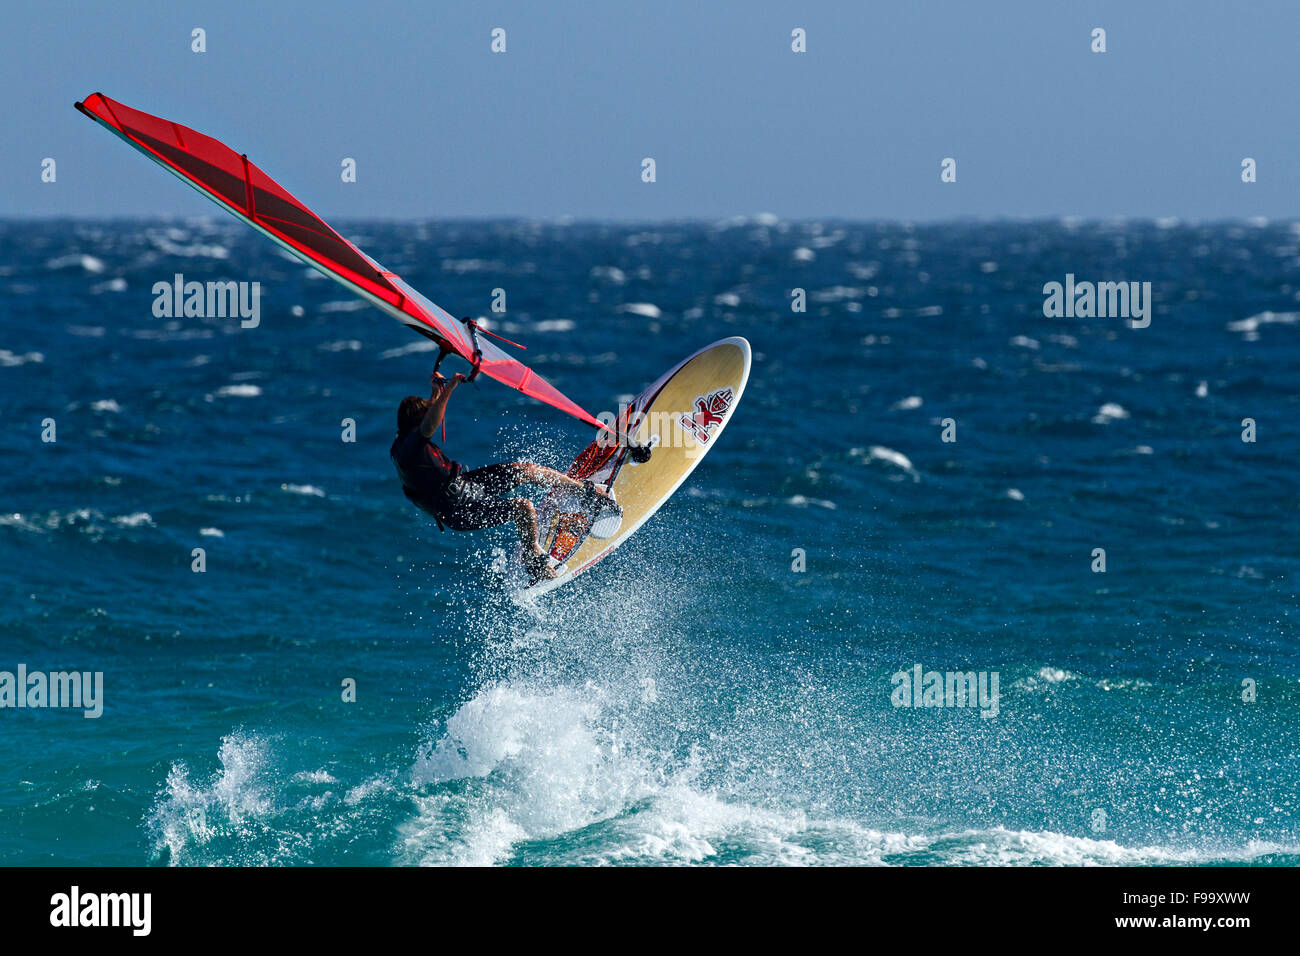 Wind Surfer wave jumping, Esperance, Western Australia. Immagini Stock